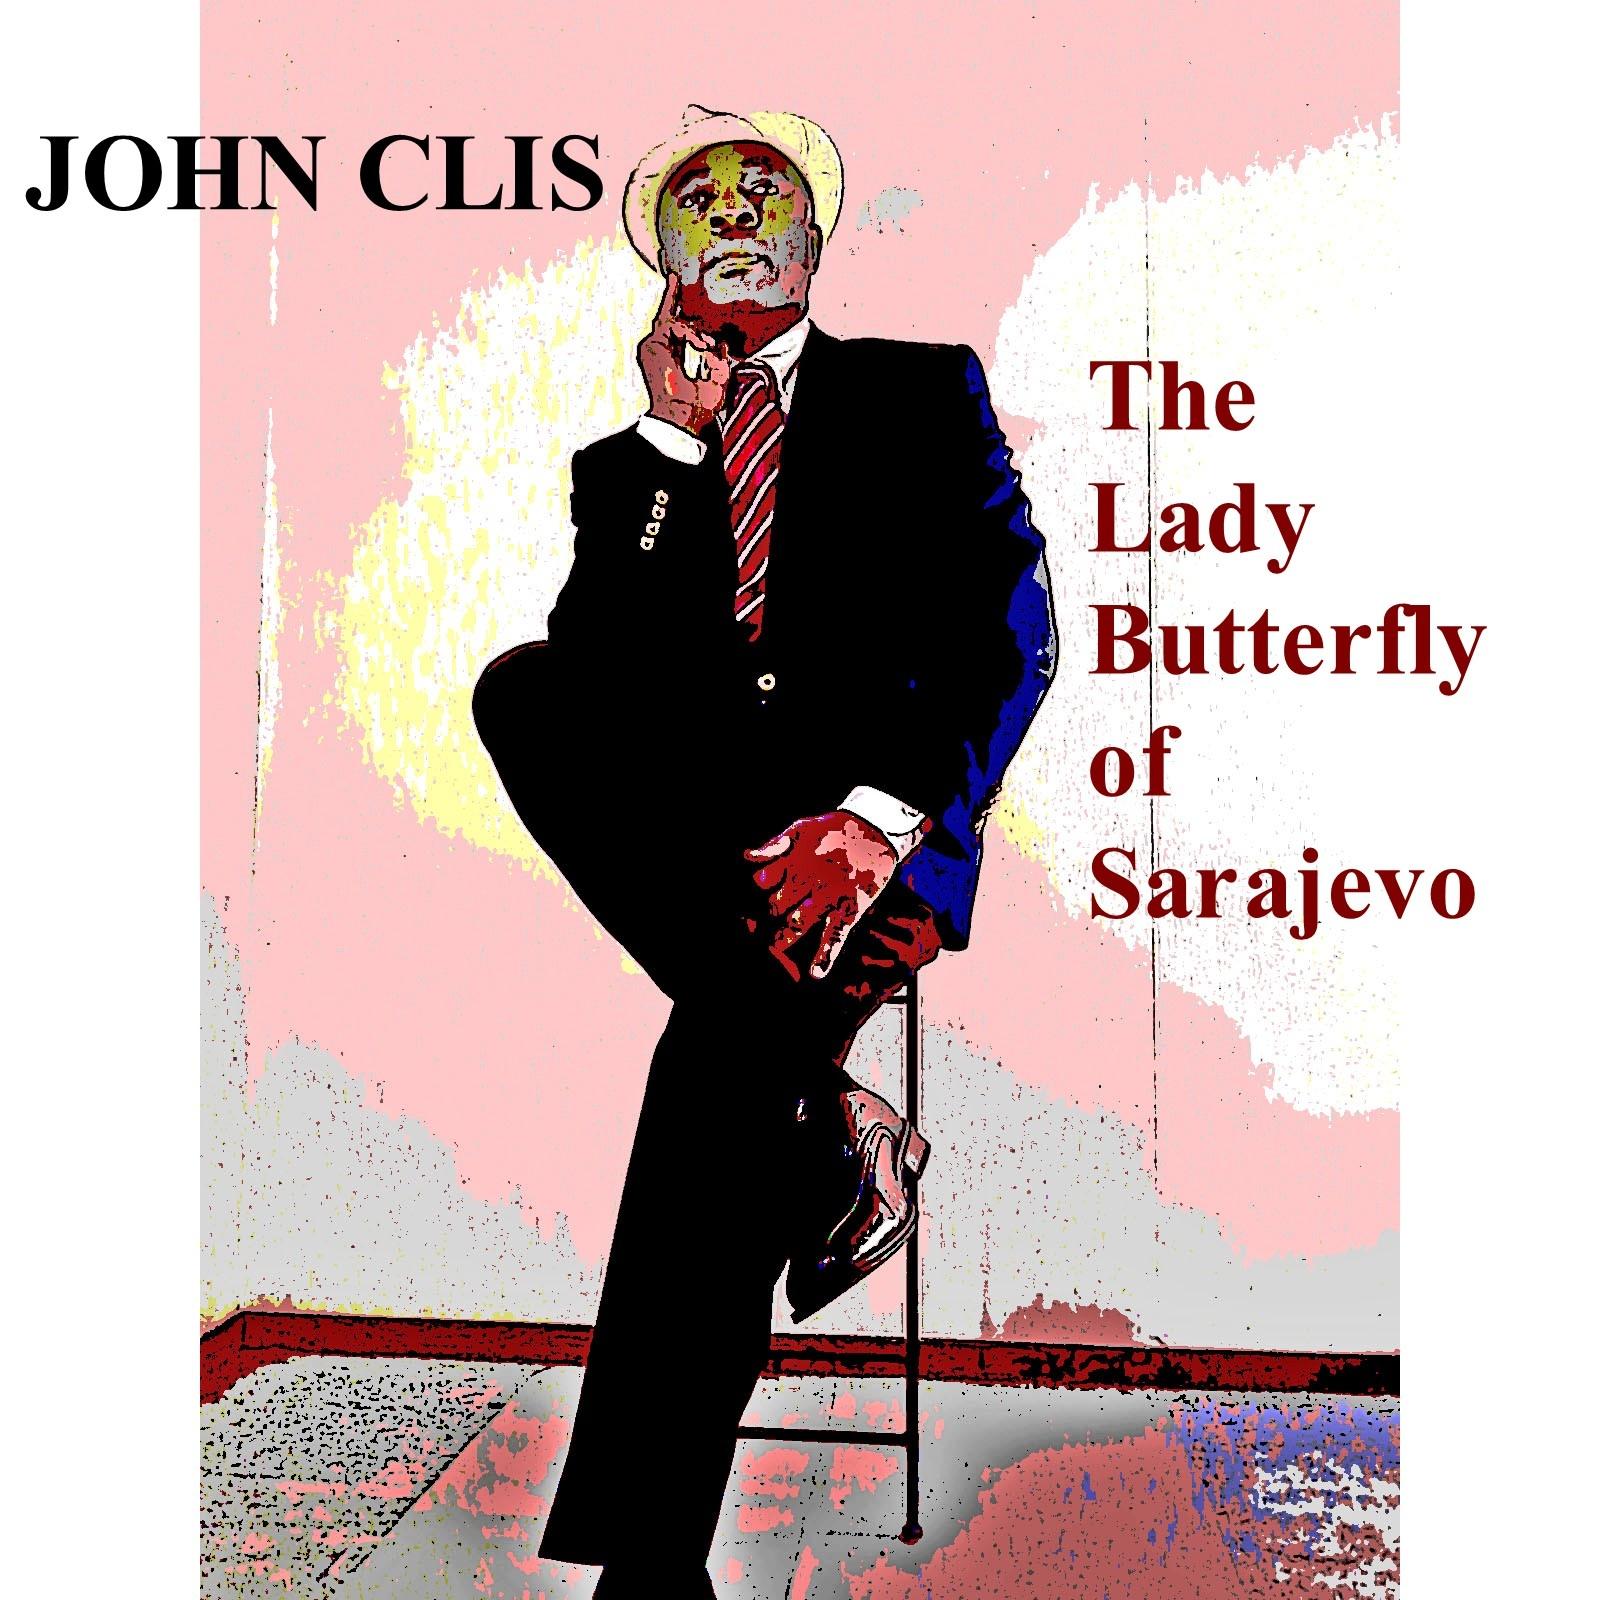 https://0201.nccdn.net/1_2/000/000/0a1/d72/John-Clis---The-Lady-Butterfly-of-Sarajevo---Pic-1-1600x1600.jpg